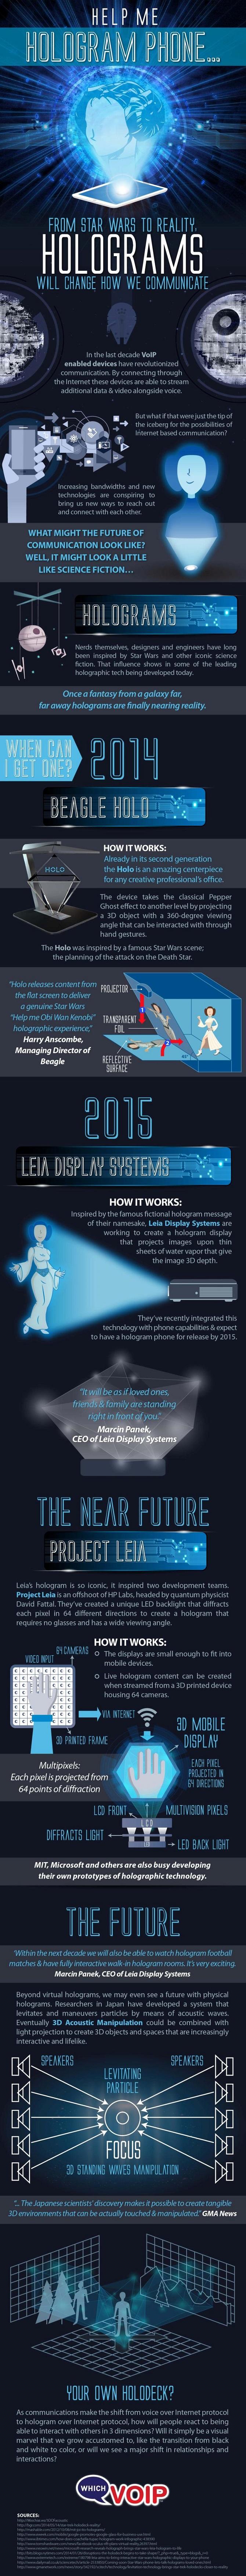 Star Wars Hologram Phones to Reshape Communications